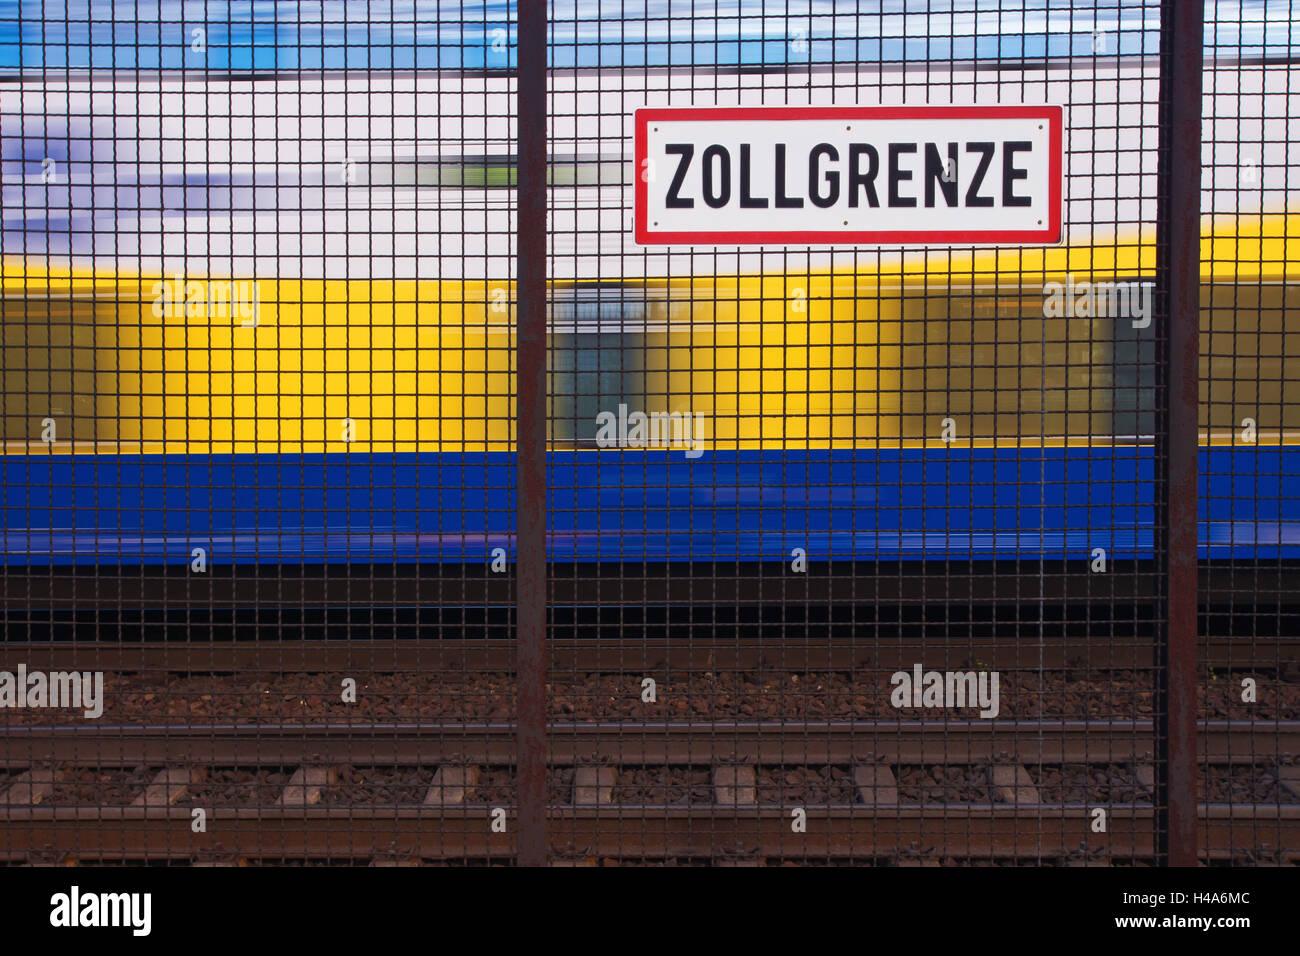 Freizonengrenze in Hamburg, fence of Zollgrenze, - Stock Image